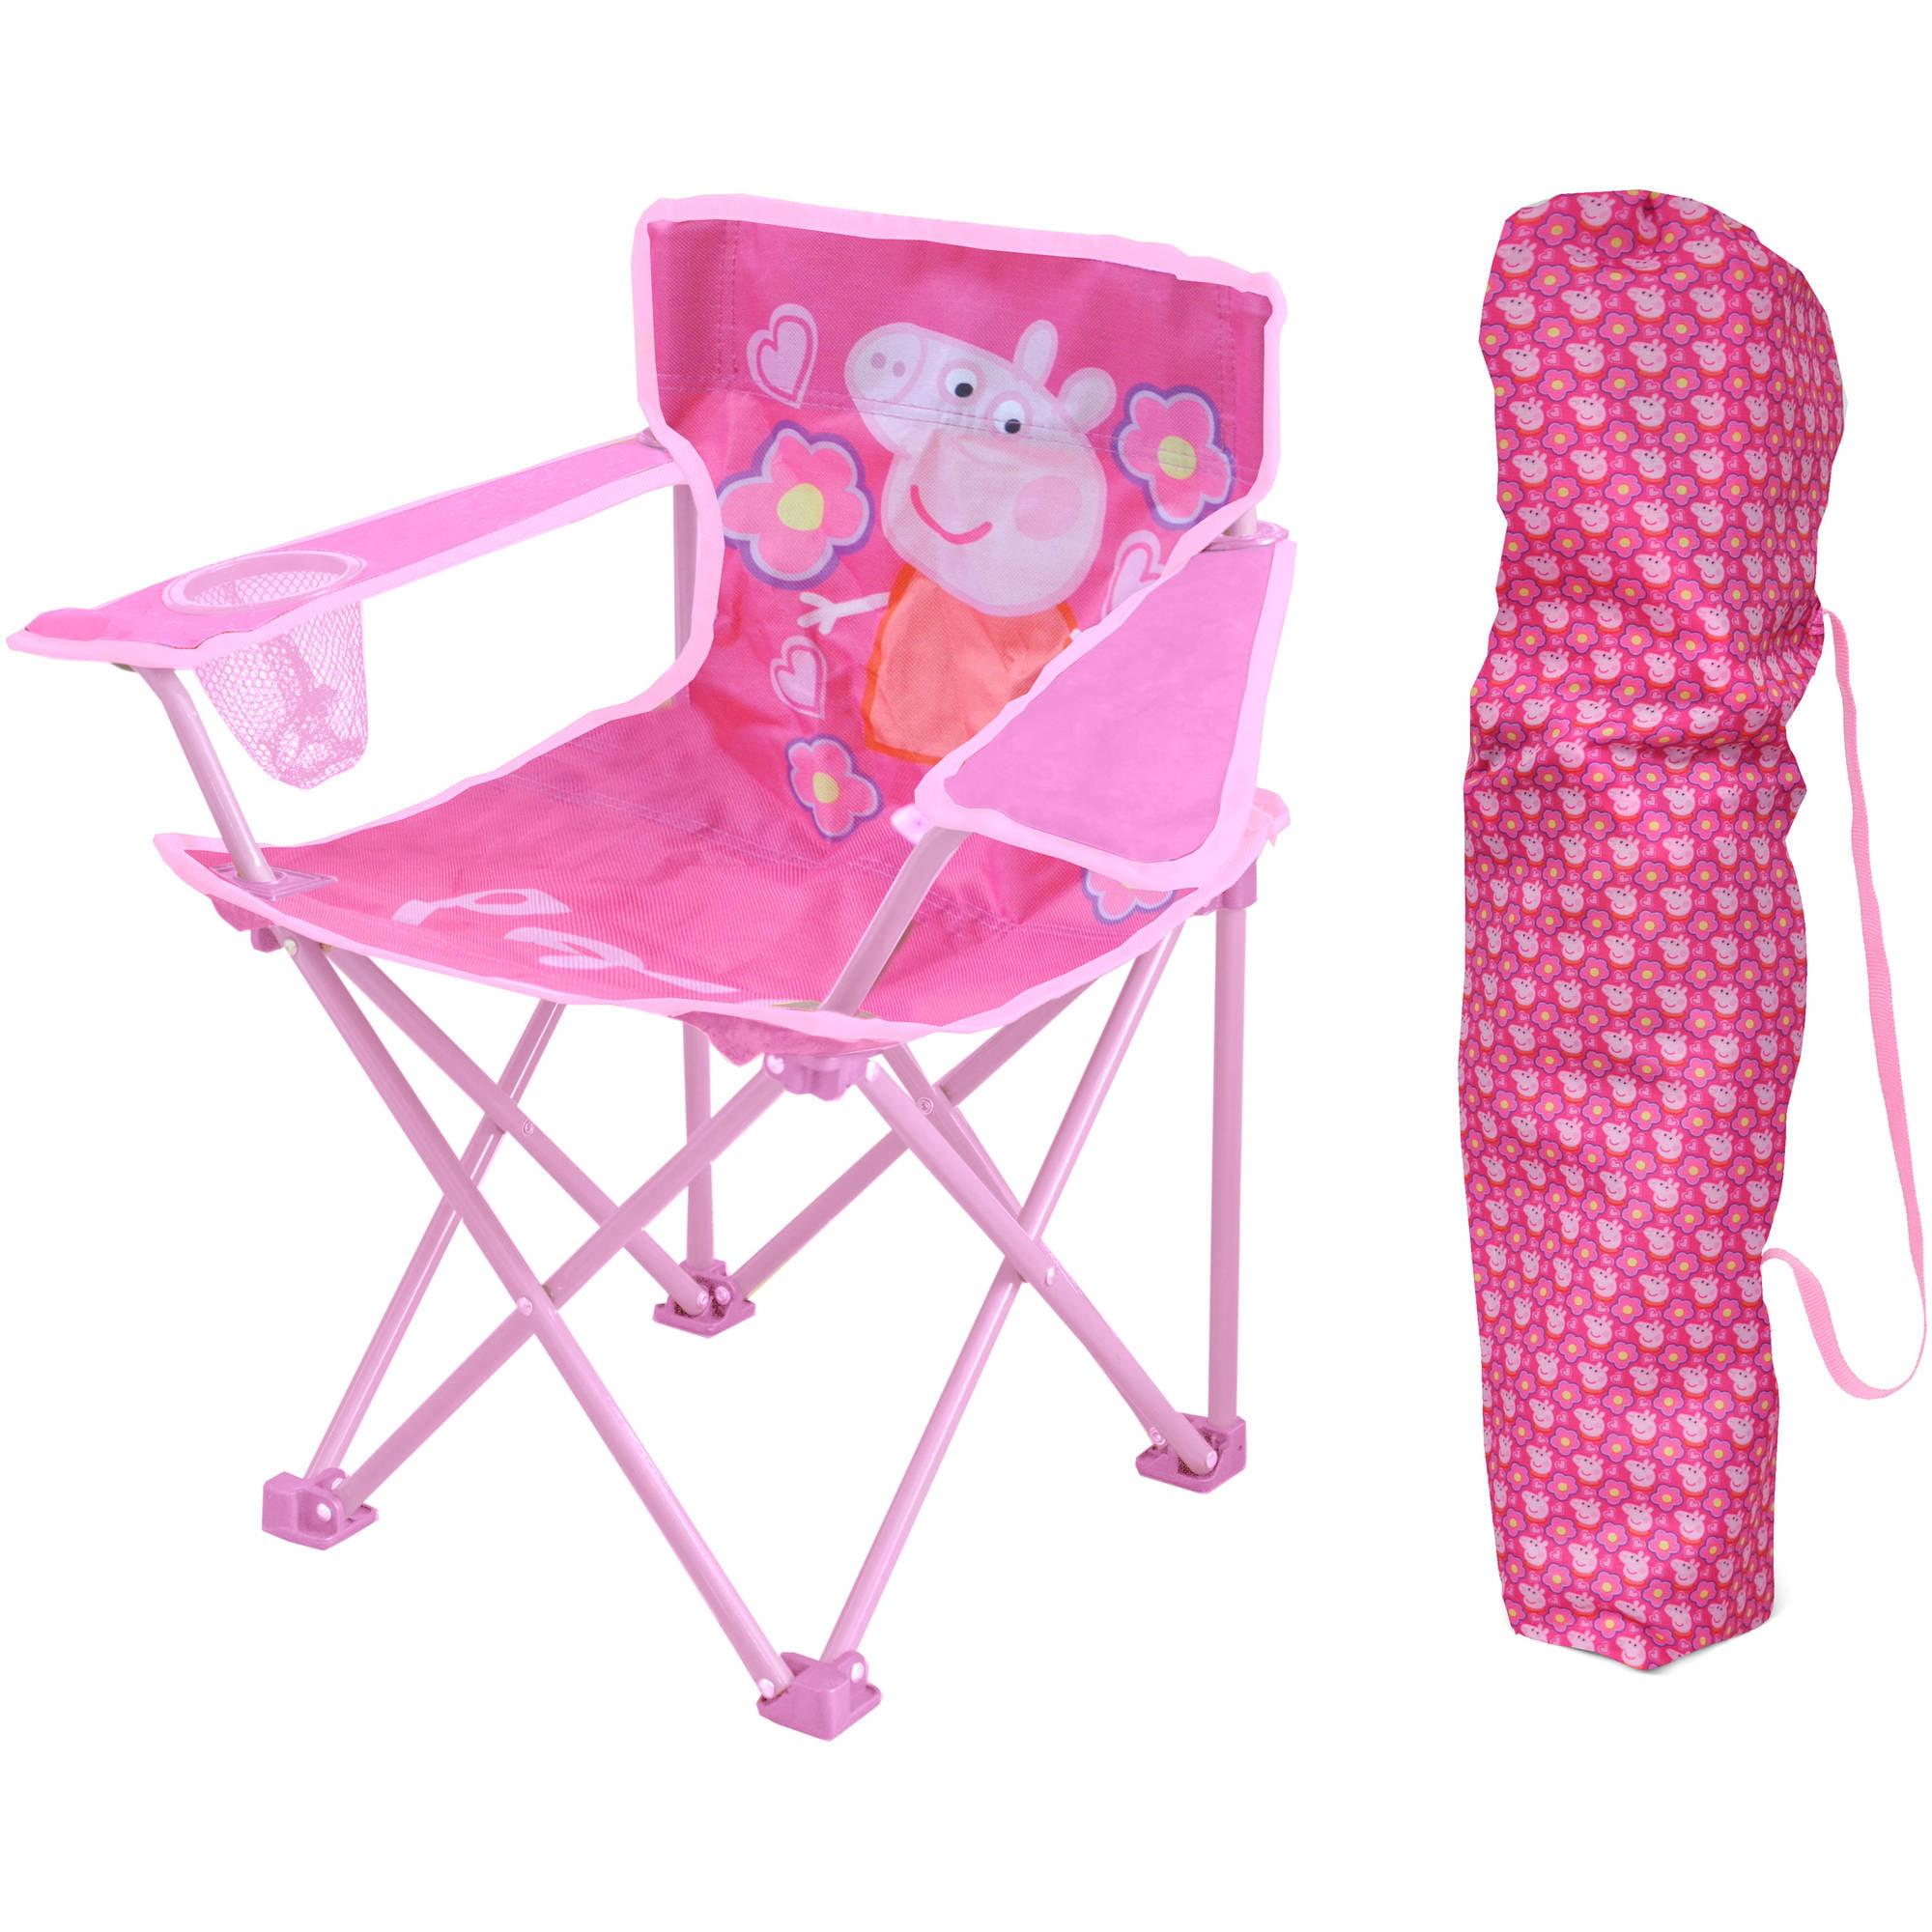 Peppa Pig Mini Camp Chair Walmart